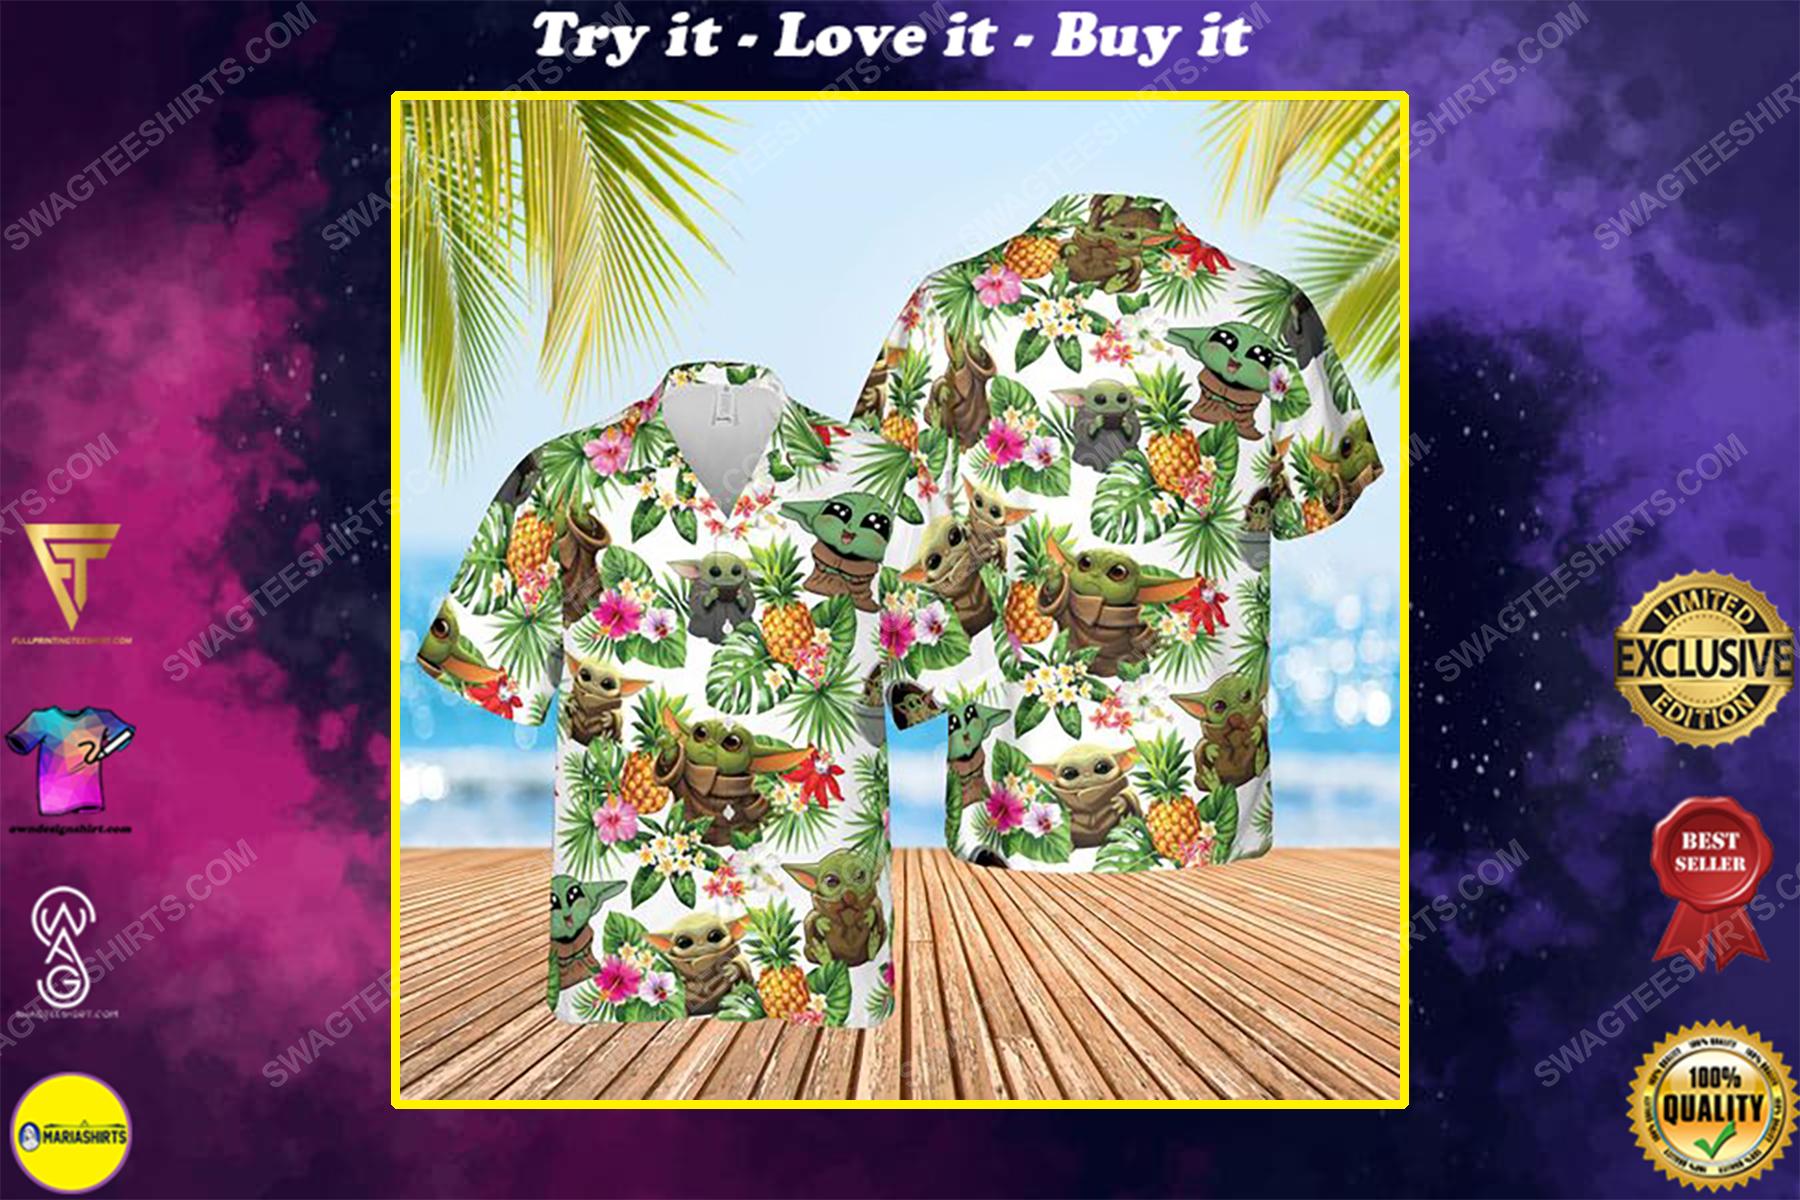 Tropical fruits star wars baby yoda summer vacation hawaiian shirt